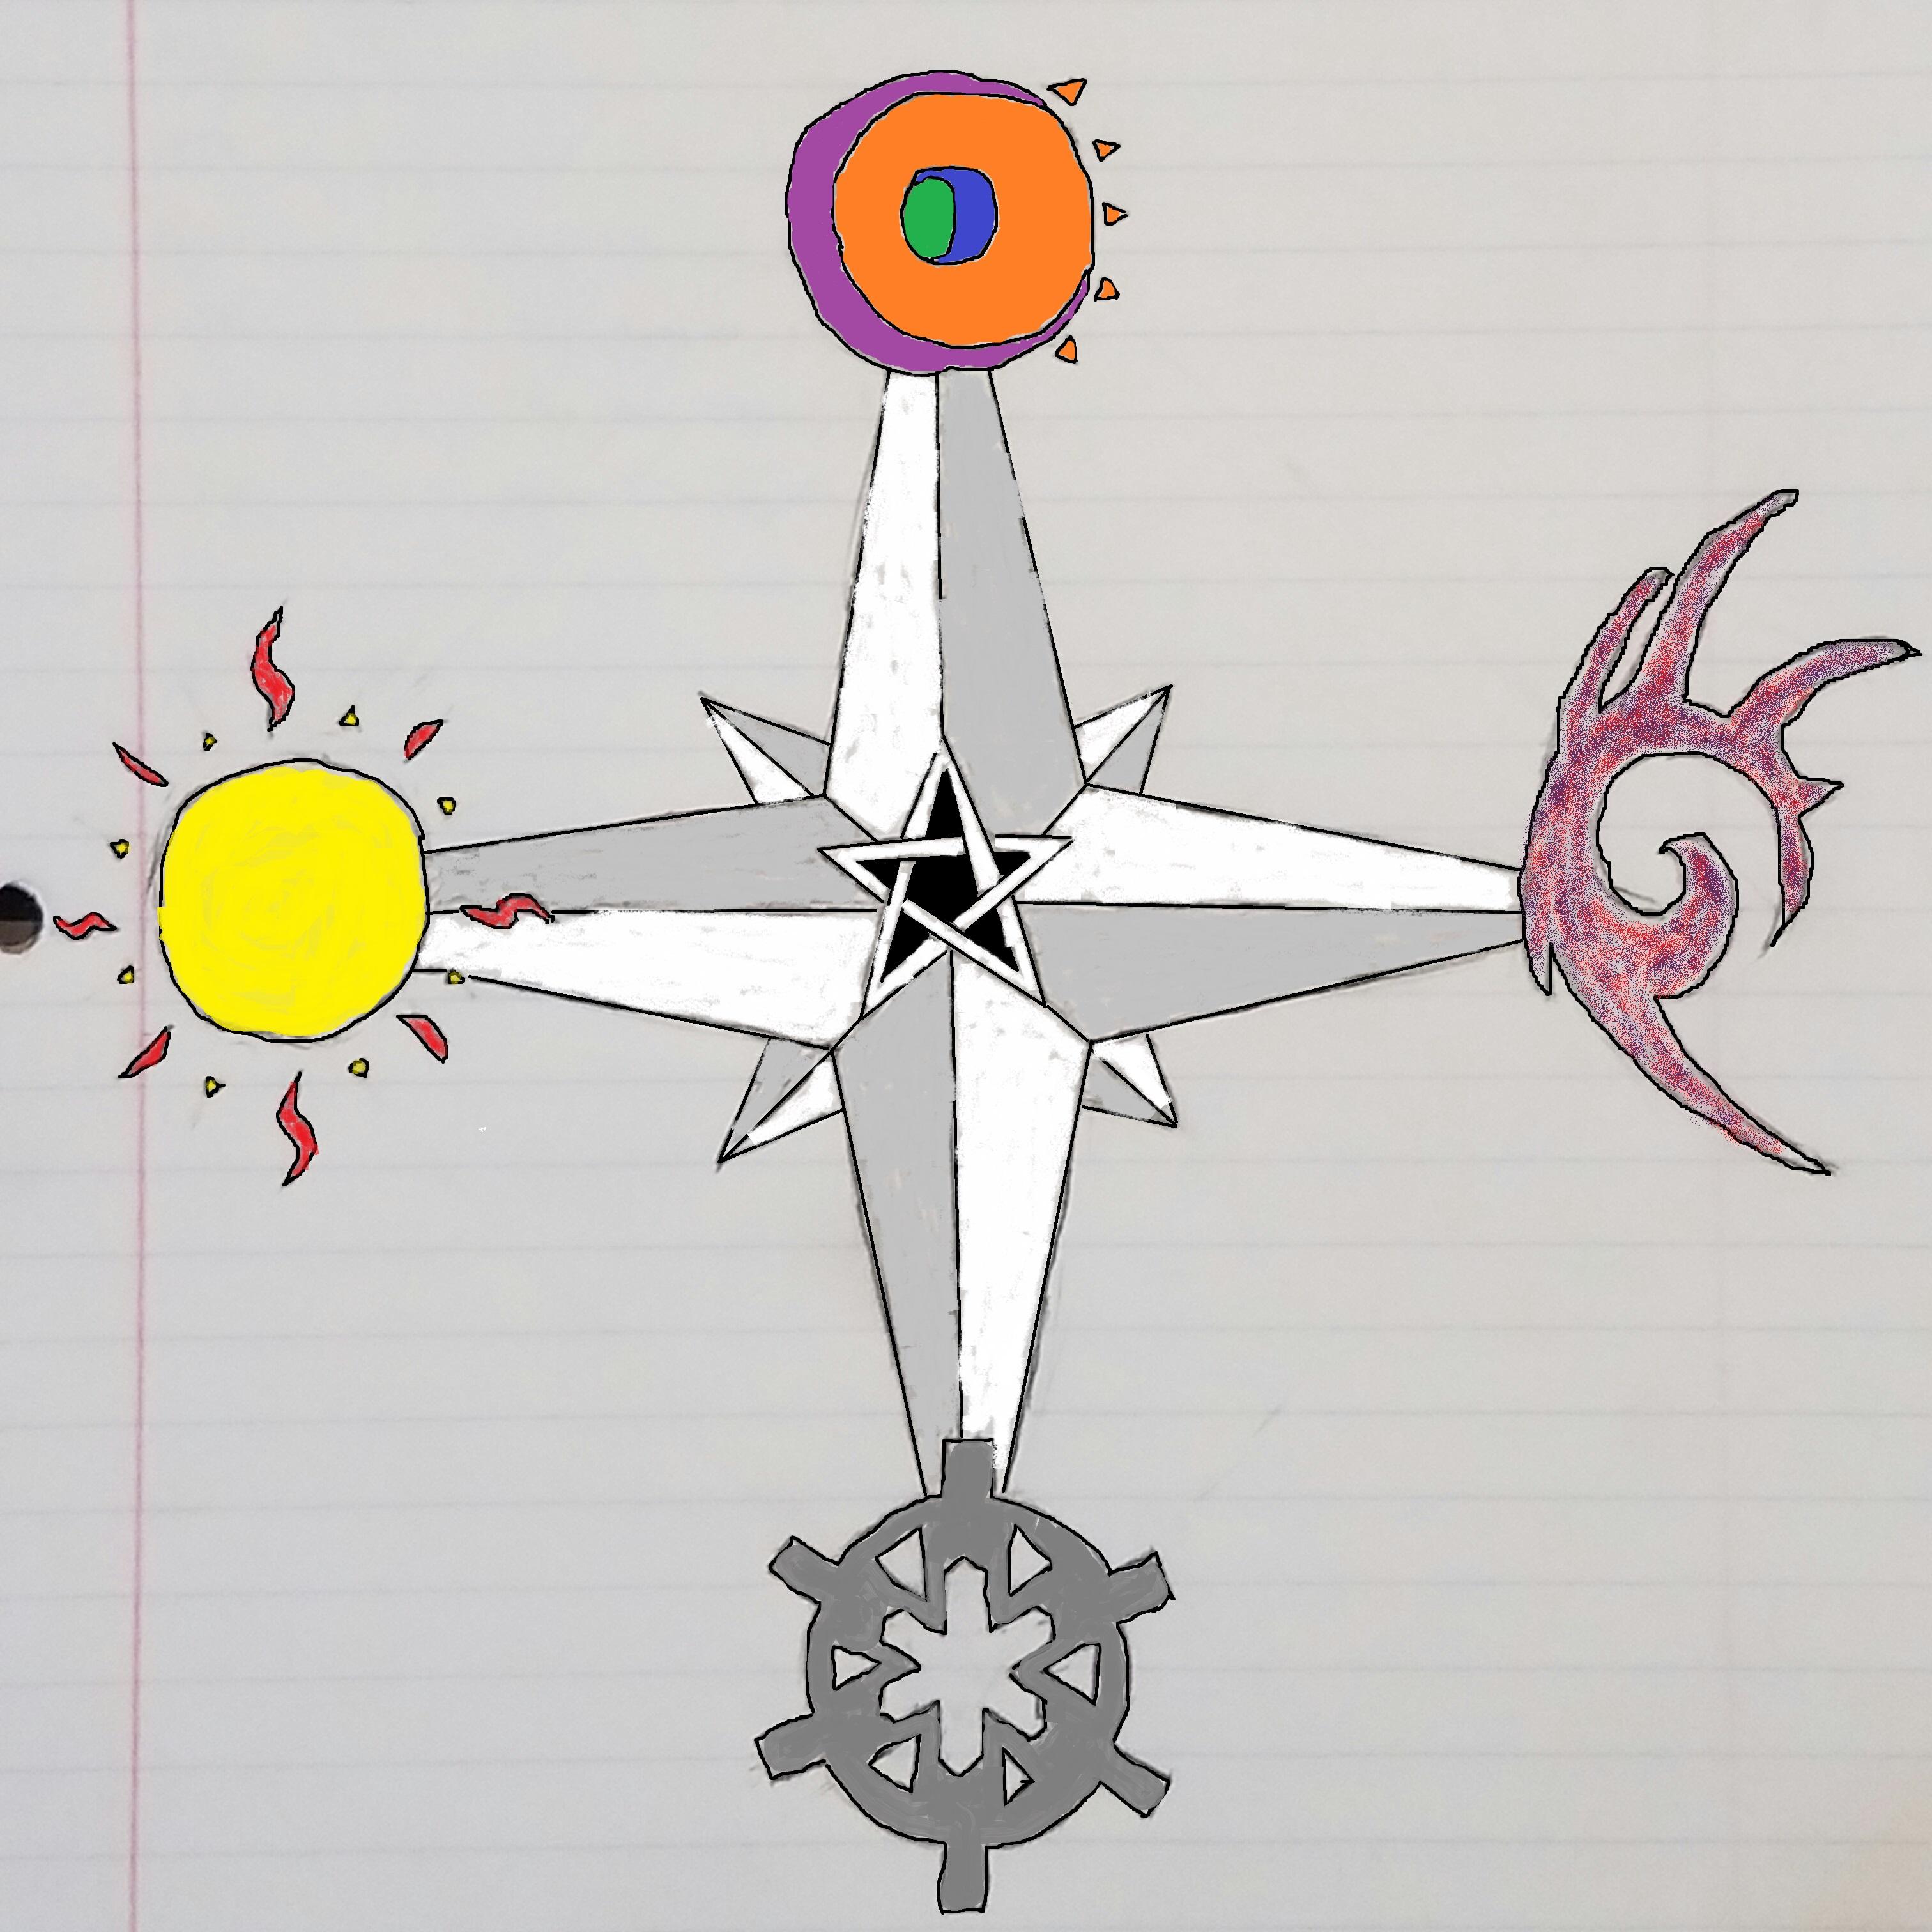 Symbol of Zhtru(True) Knighte